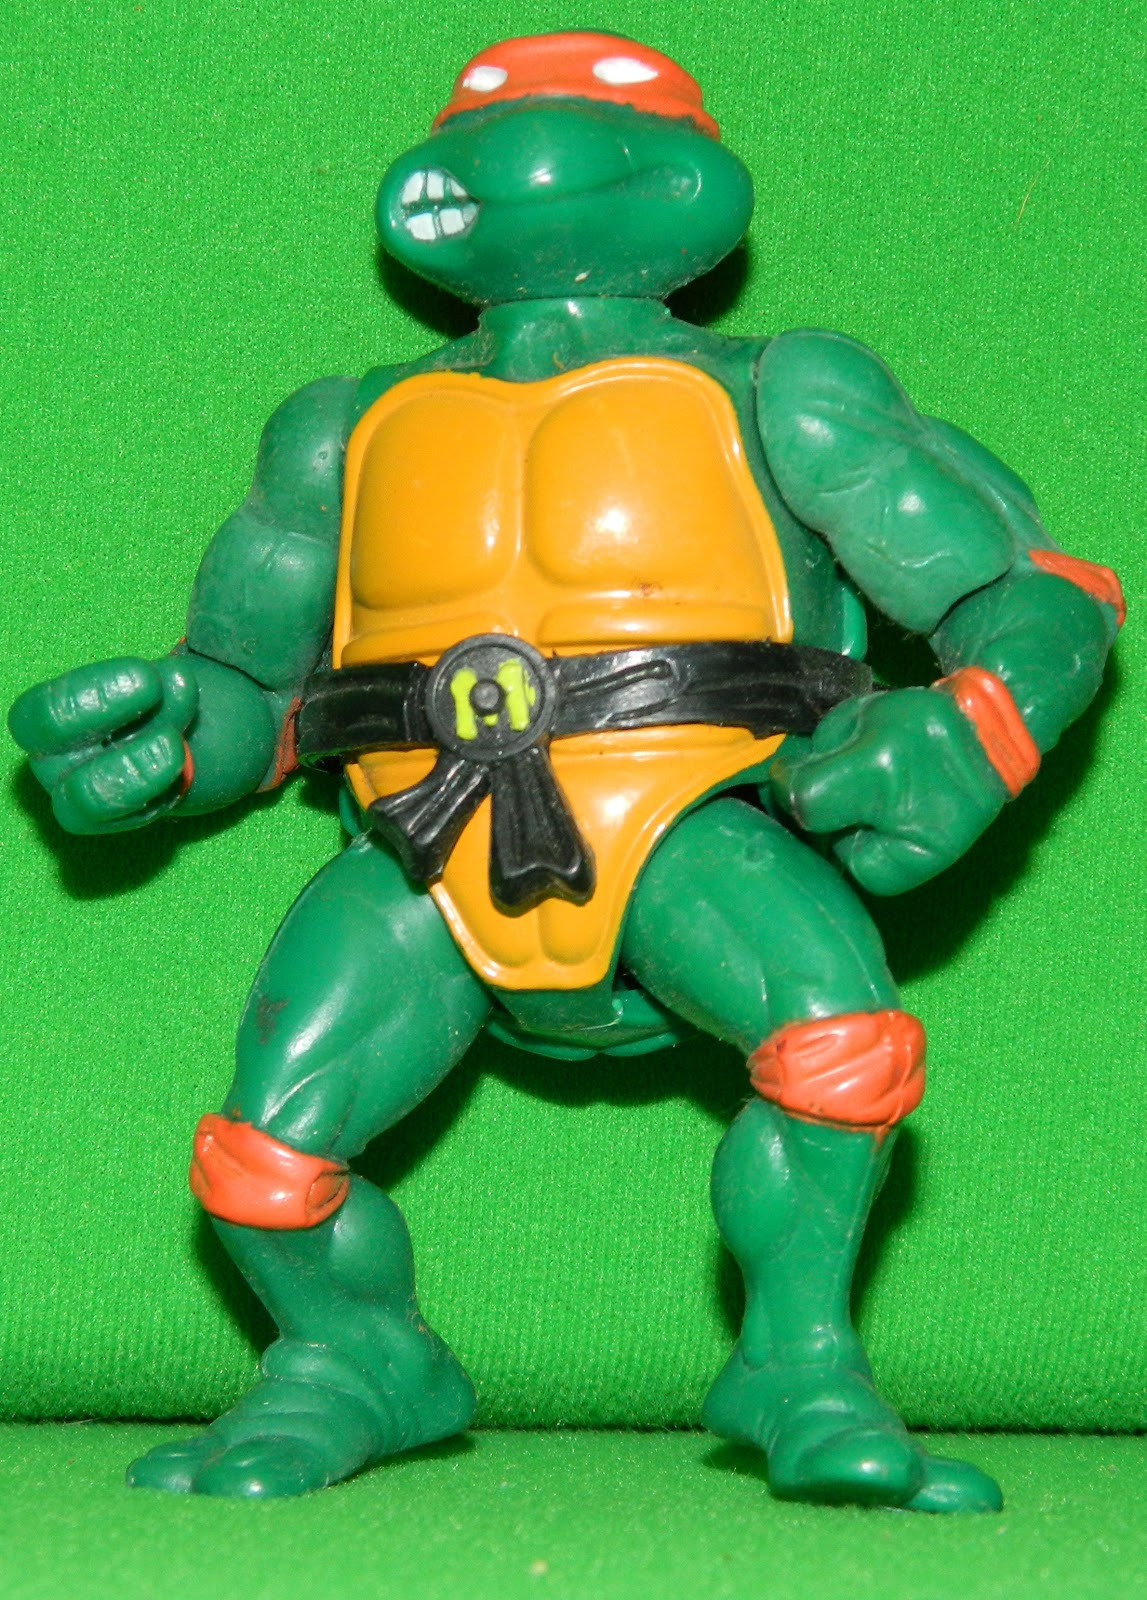 Old 80s Toys : The voodoo vintage s toys transformers gi joe tmnt